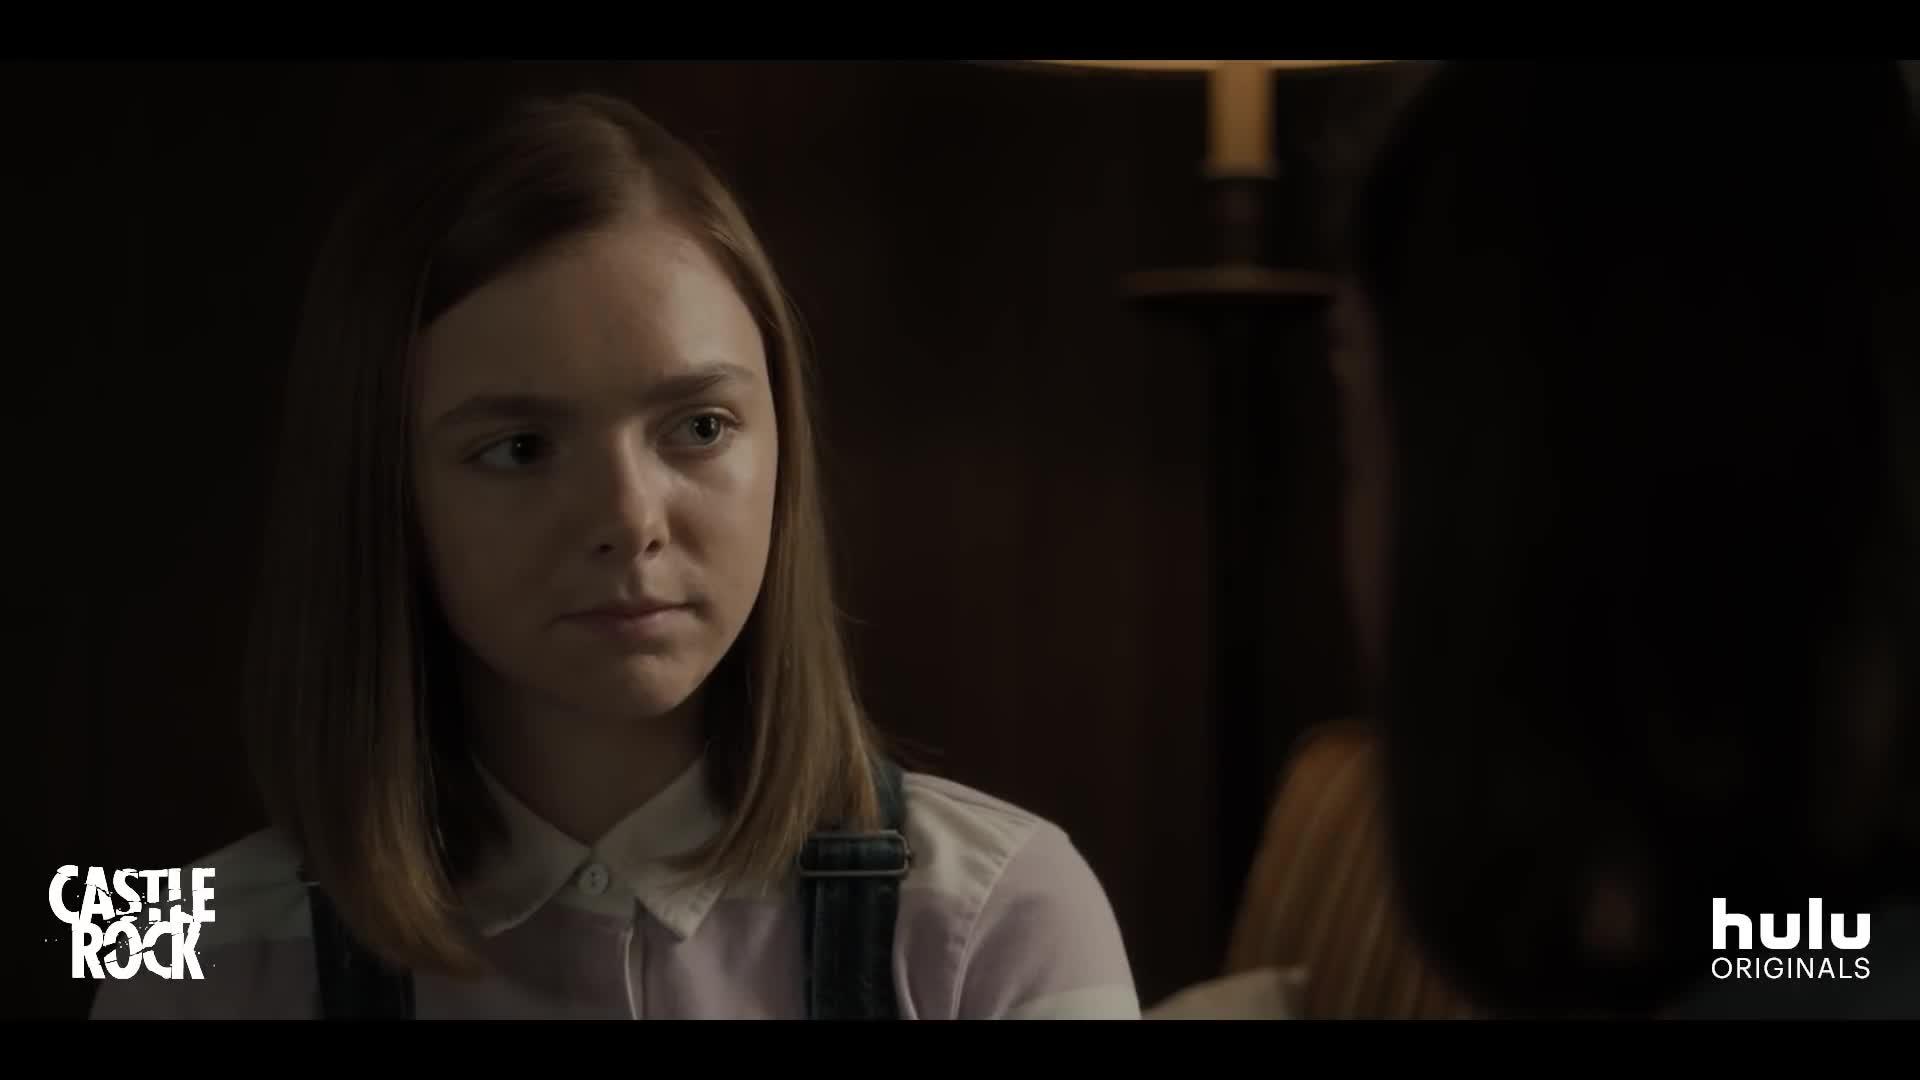 Castle Rock (Season 2) - Official Trailer [HD] screen capture